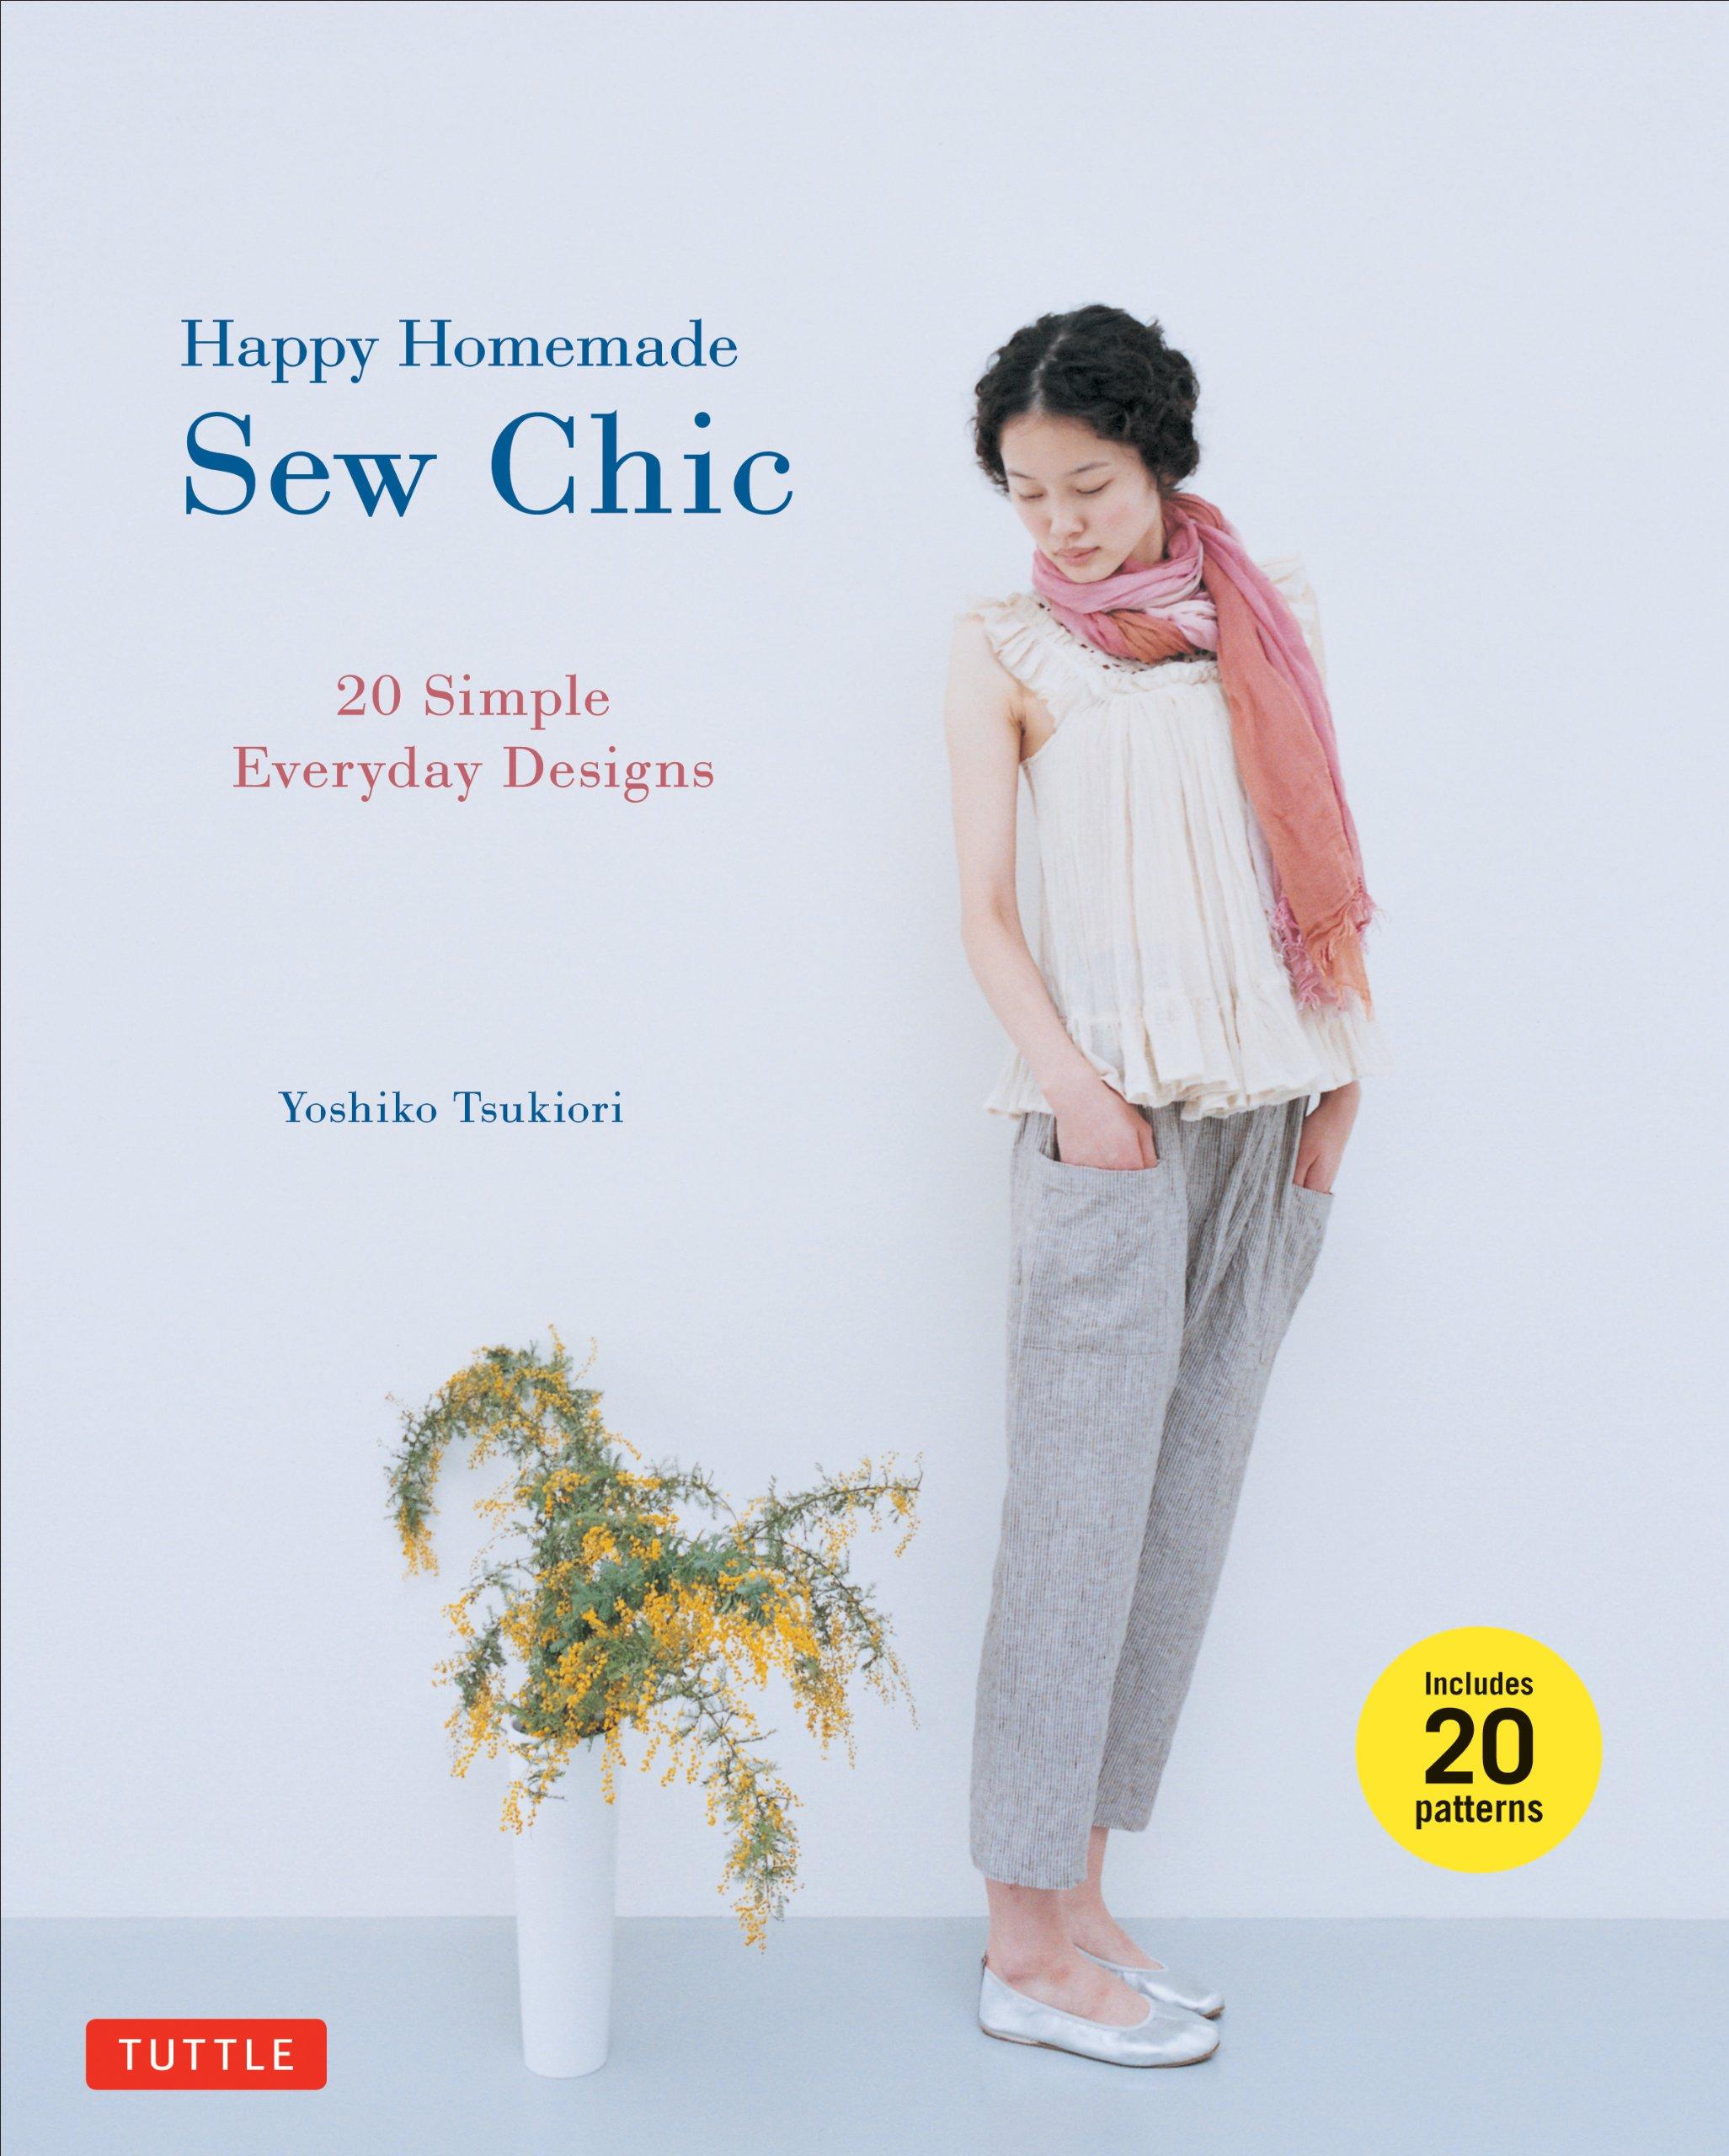 Amazon com: Happy Homemade: Sew Chic: 20 Simple Everyday Designs